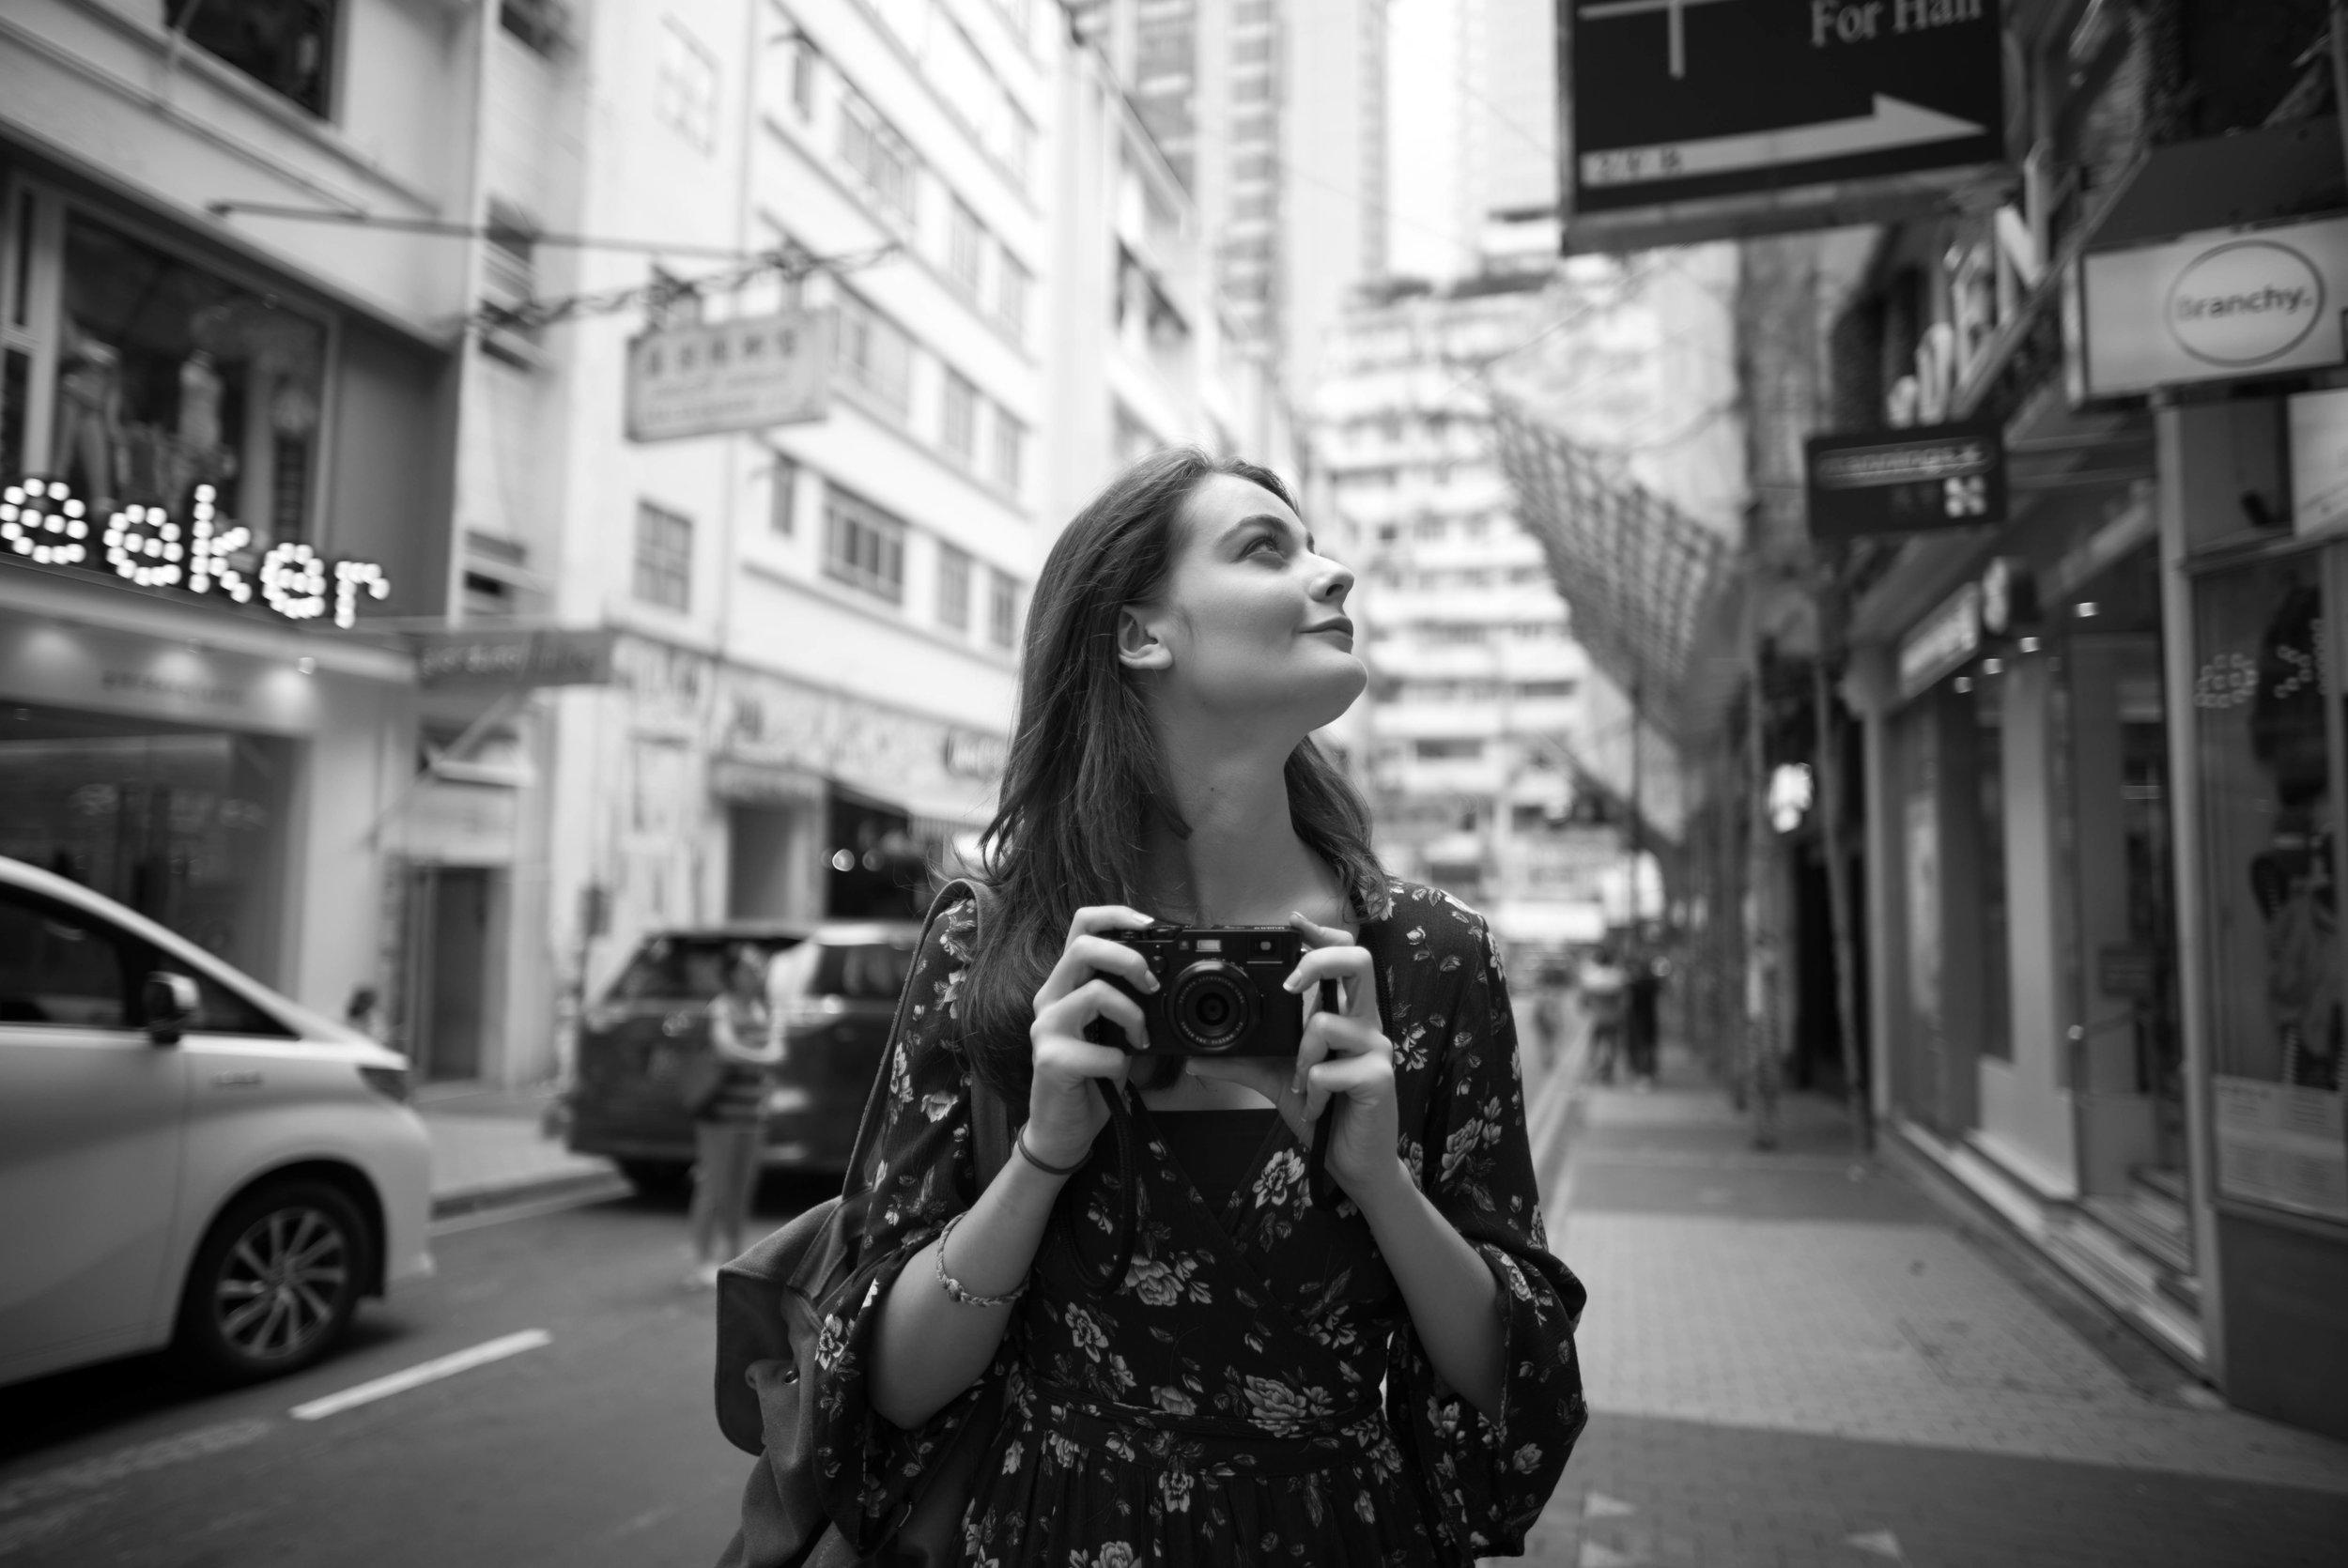 Leica M246 + Leica 21mm f/1.4 Summilux-M ASPH - ISO 400 - RAW Image